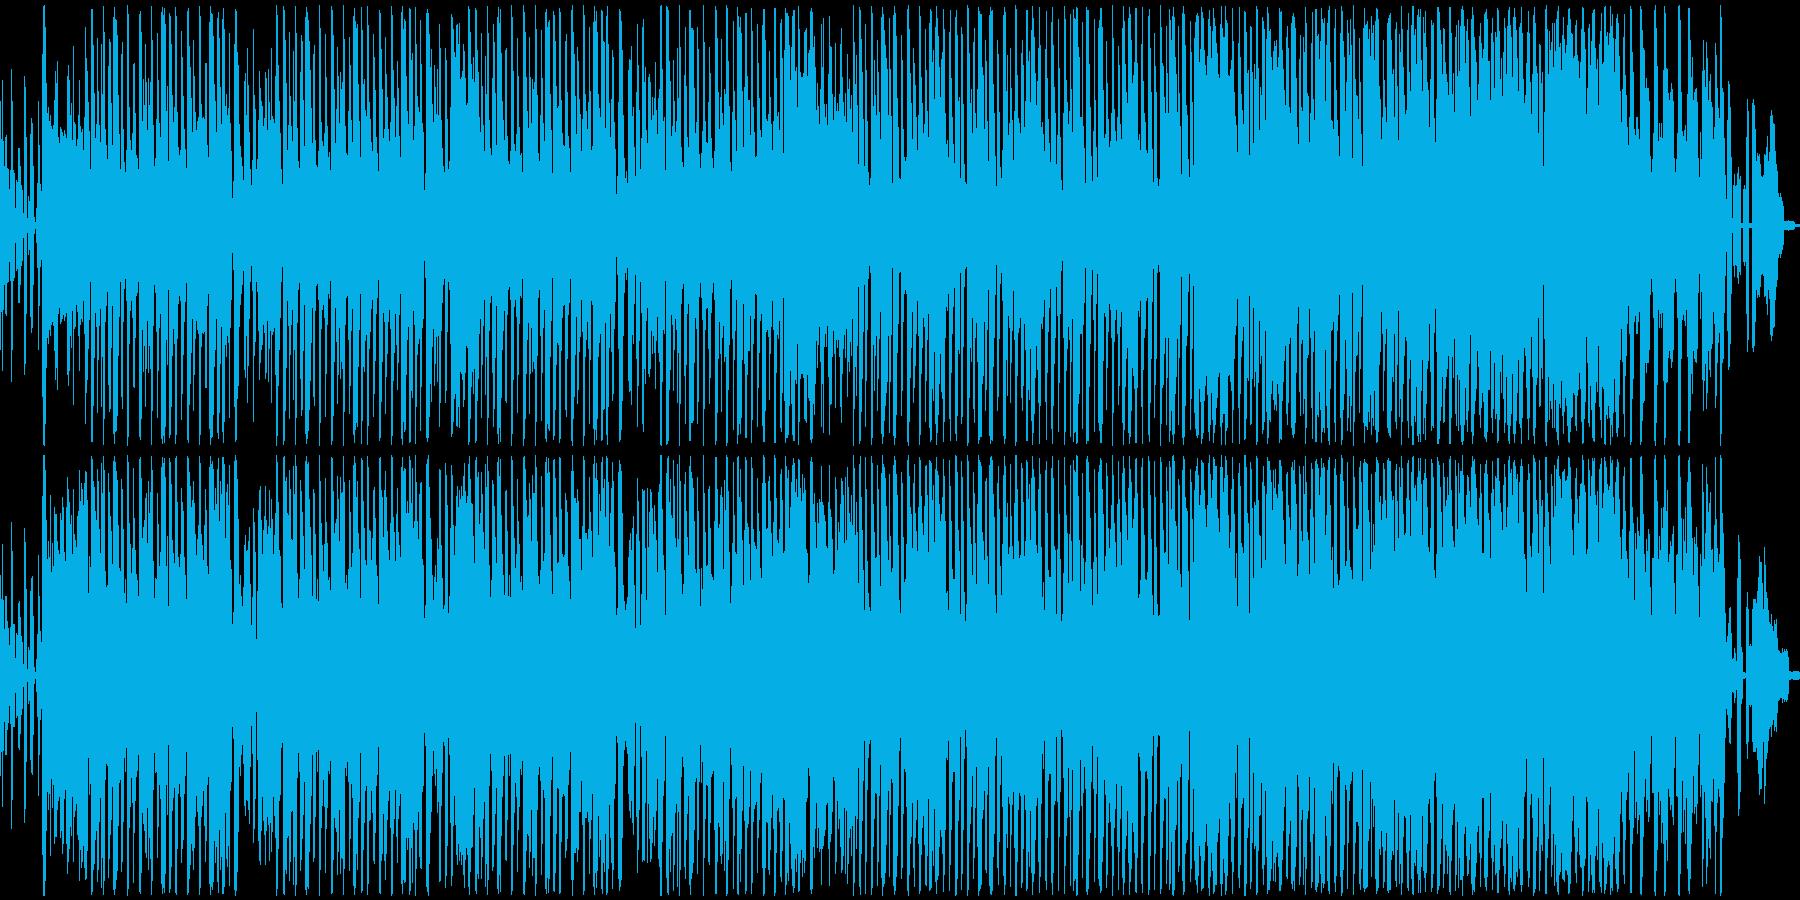 Renaissance Beatの再生済みの波形